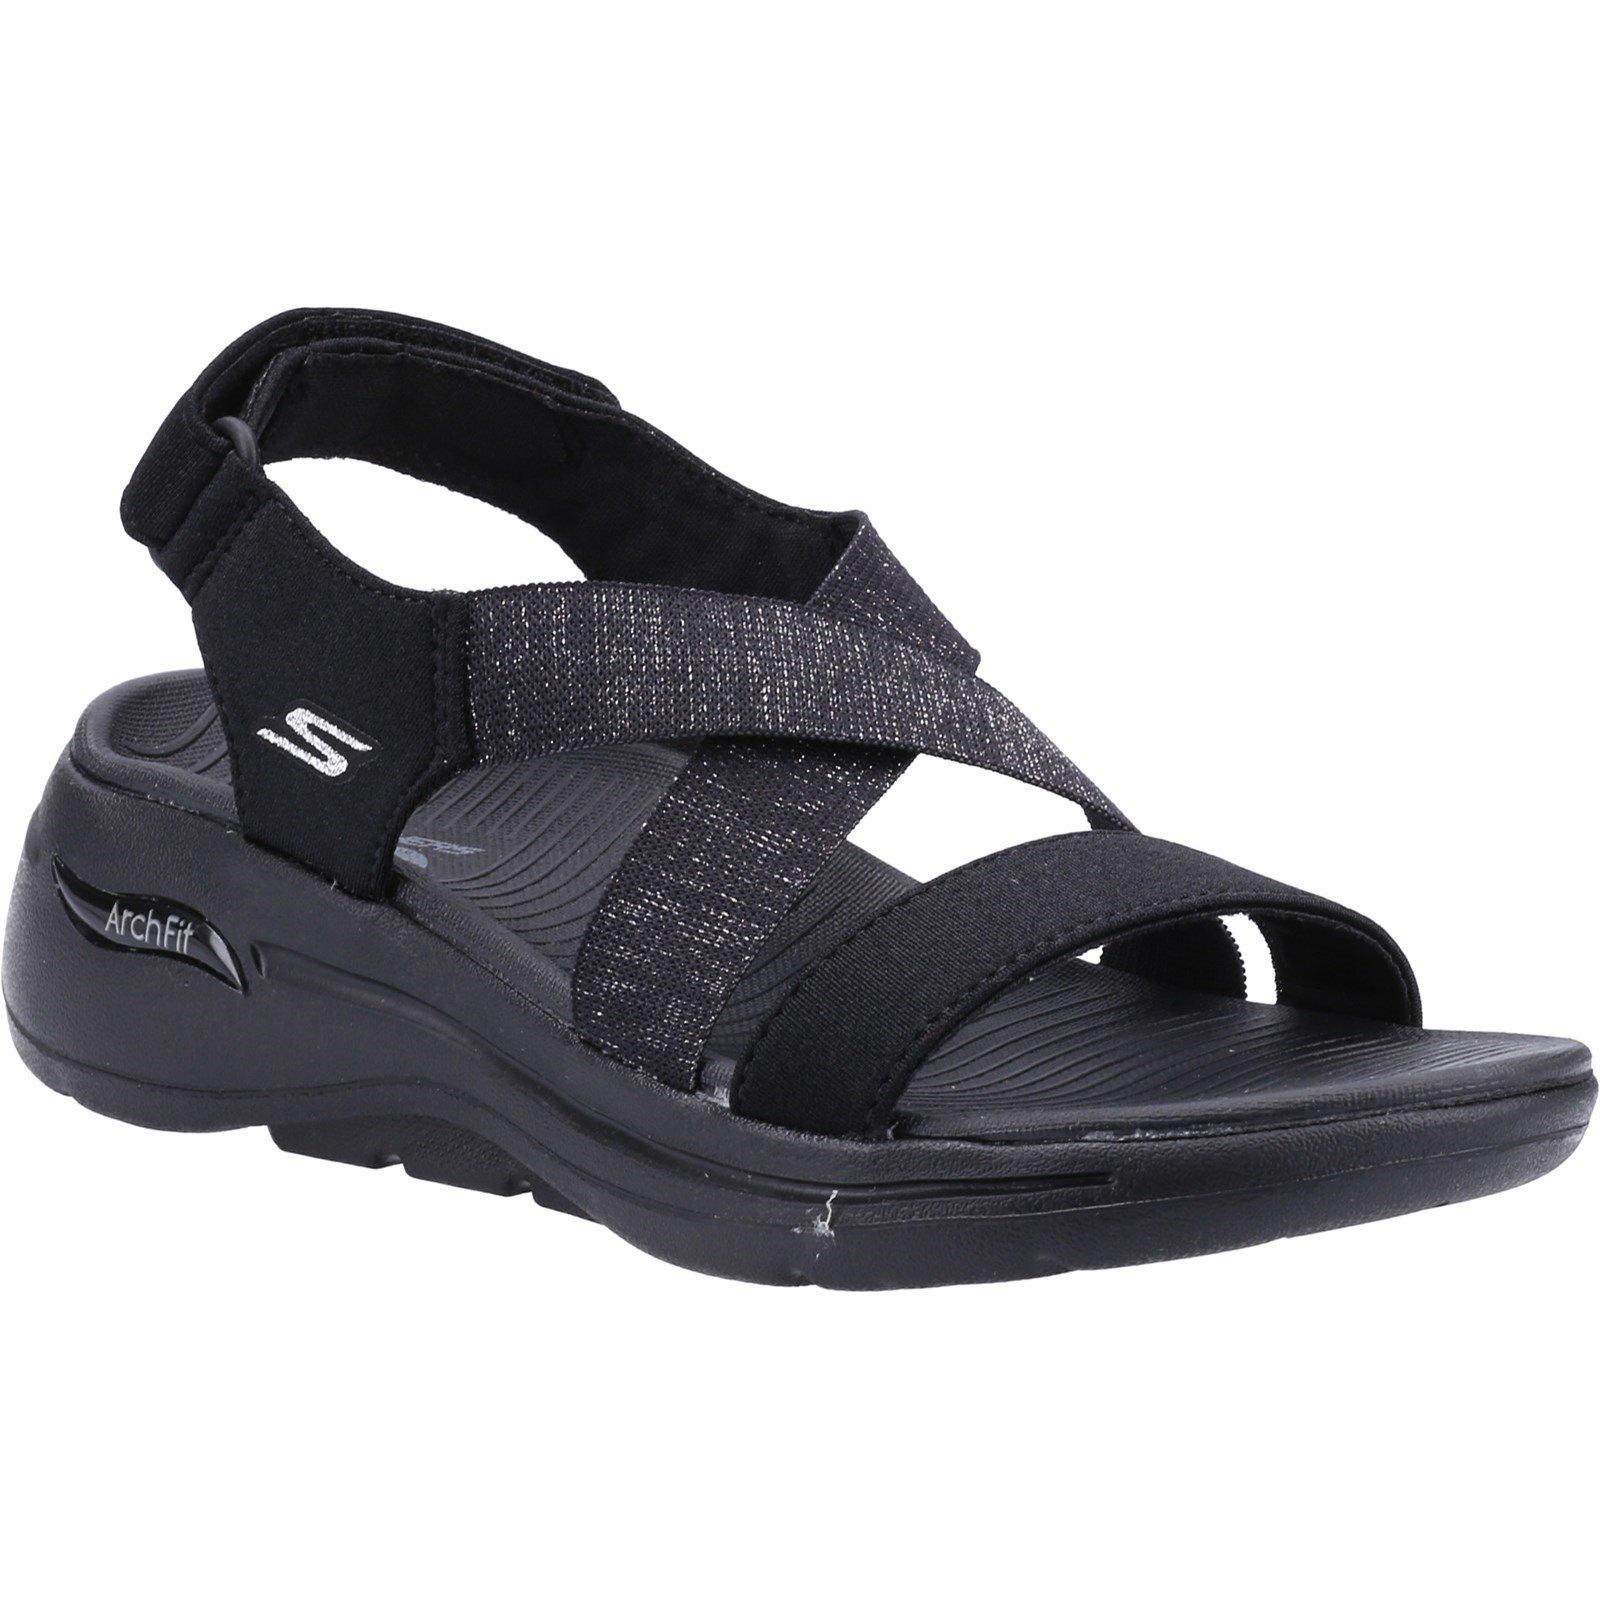 Skechers Women's Go Walk Arch Fit Astonish Summer Sandal Various Colours 32153 - Black 7